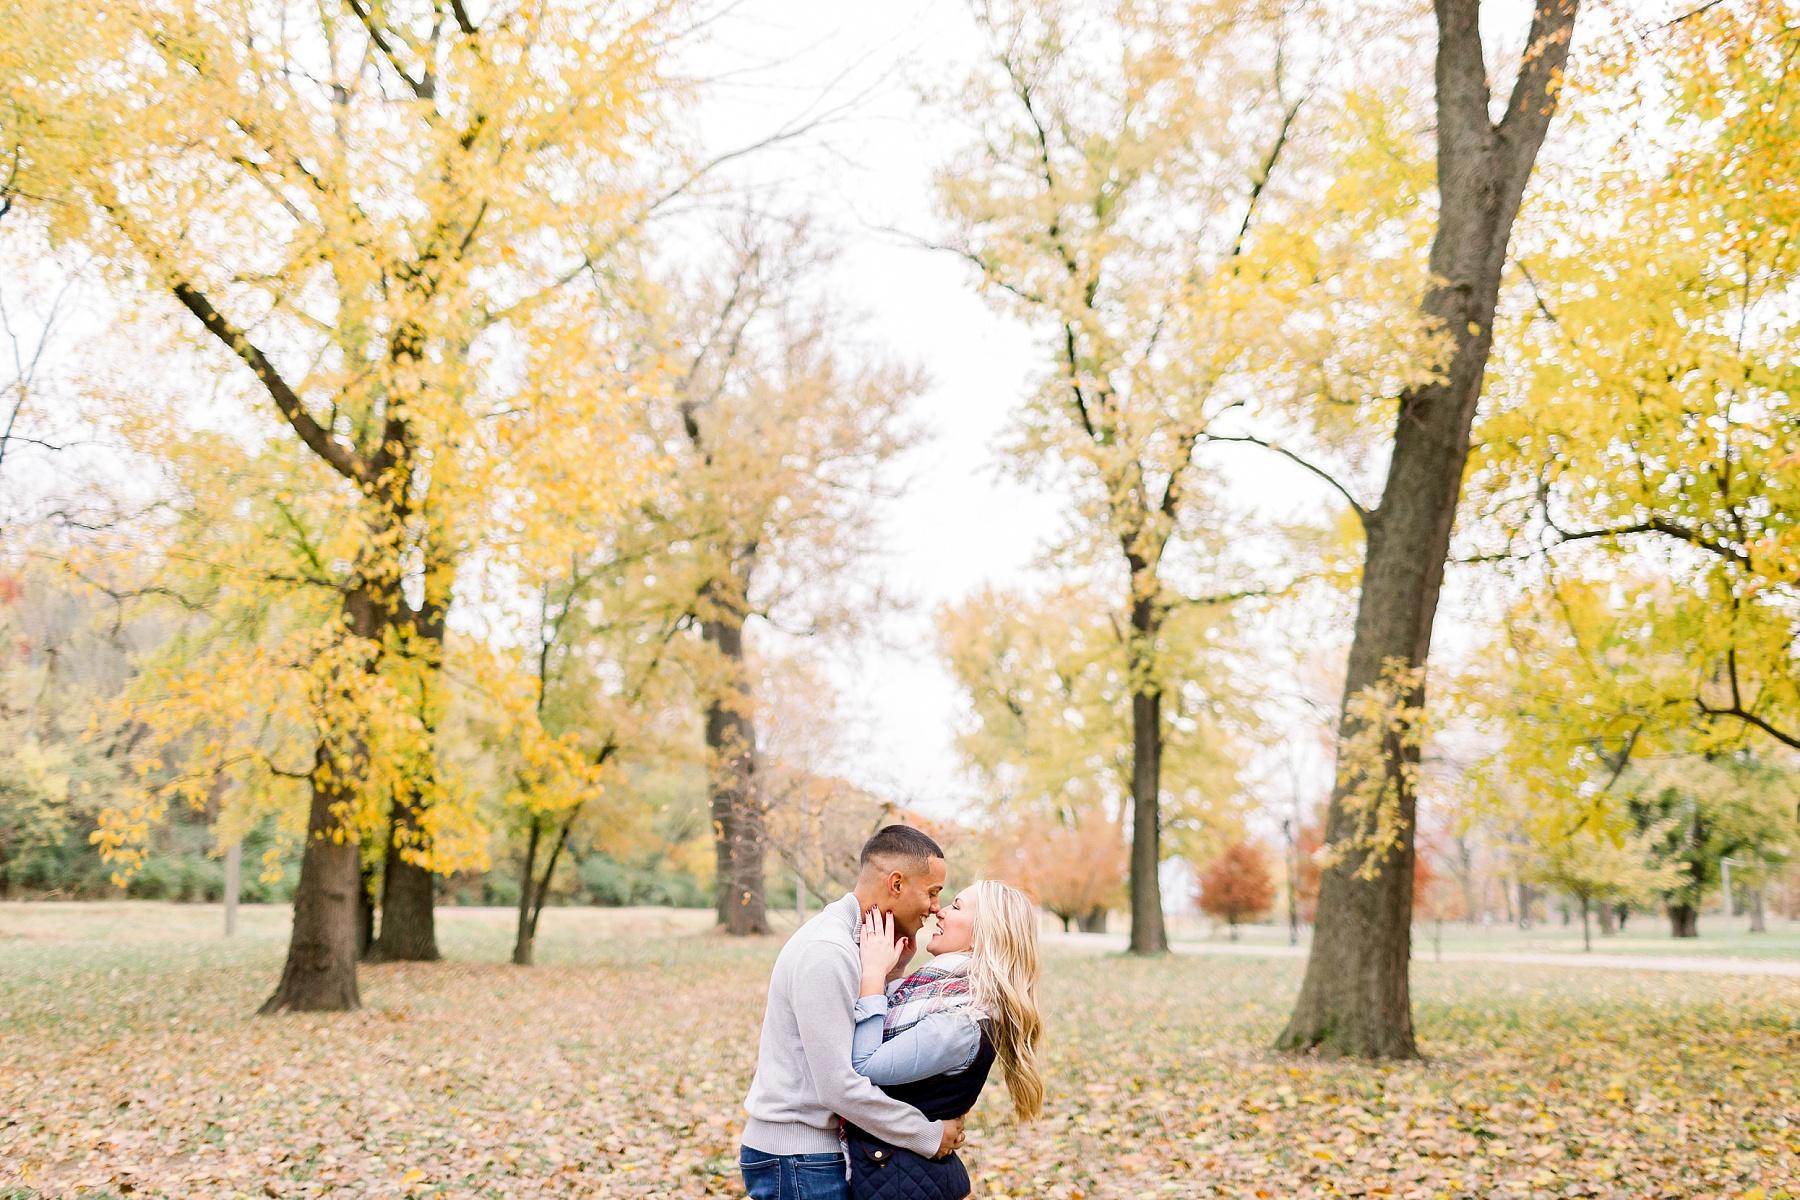 adventurous-authentic-wedding-engagement-photography-kansas-city-elizabeth-ladean-photo_5412.jpg